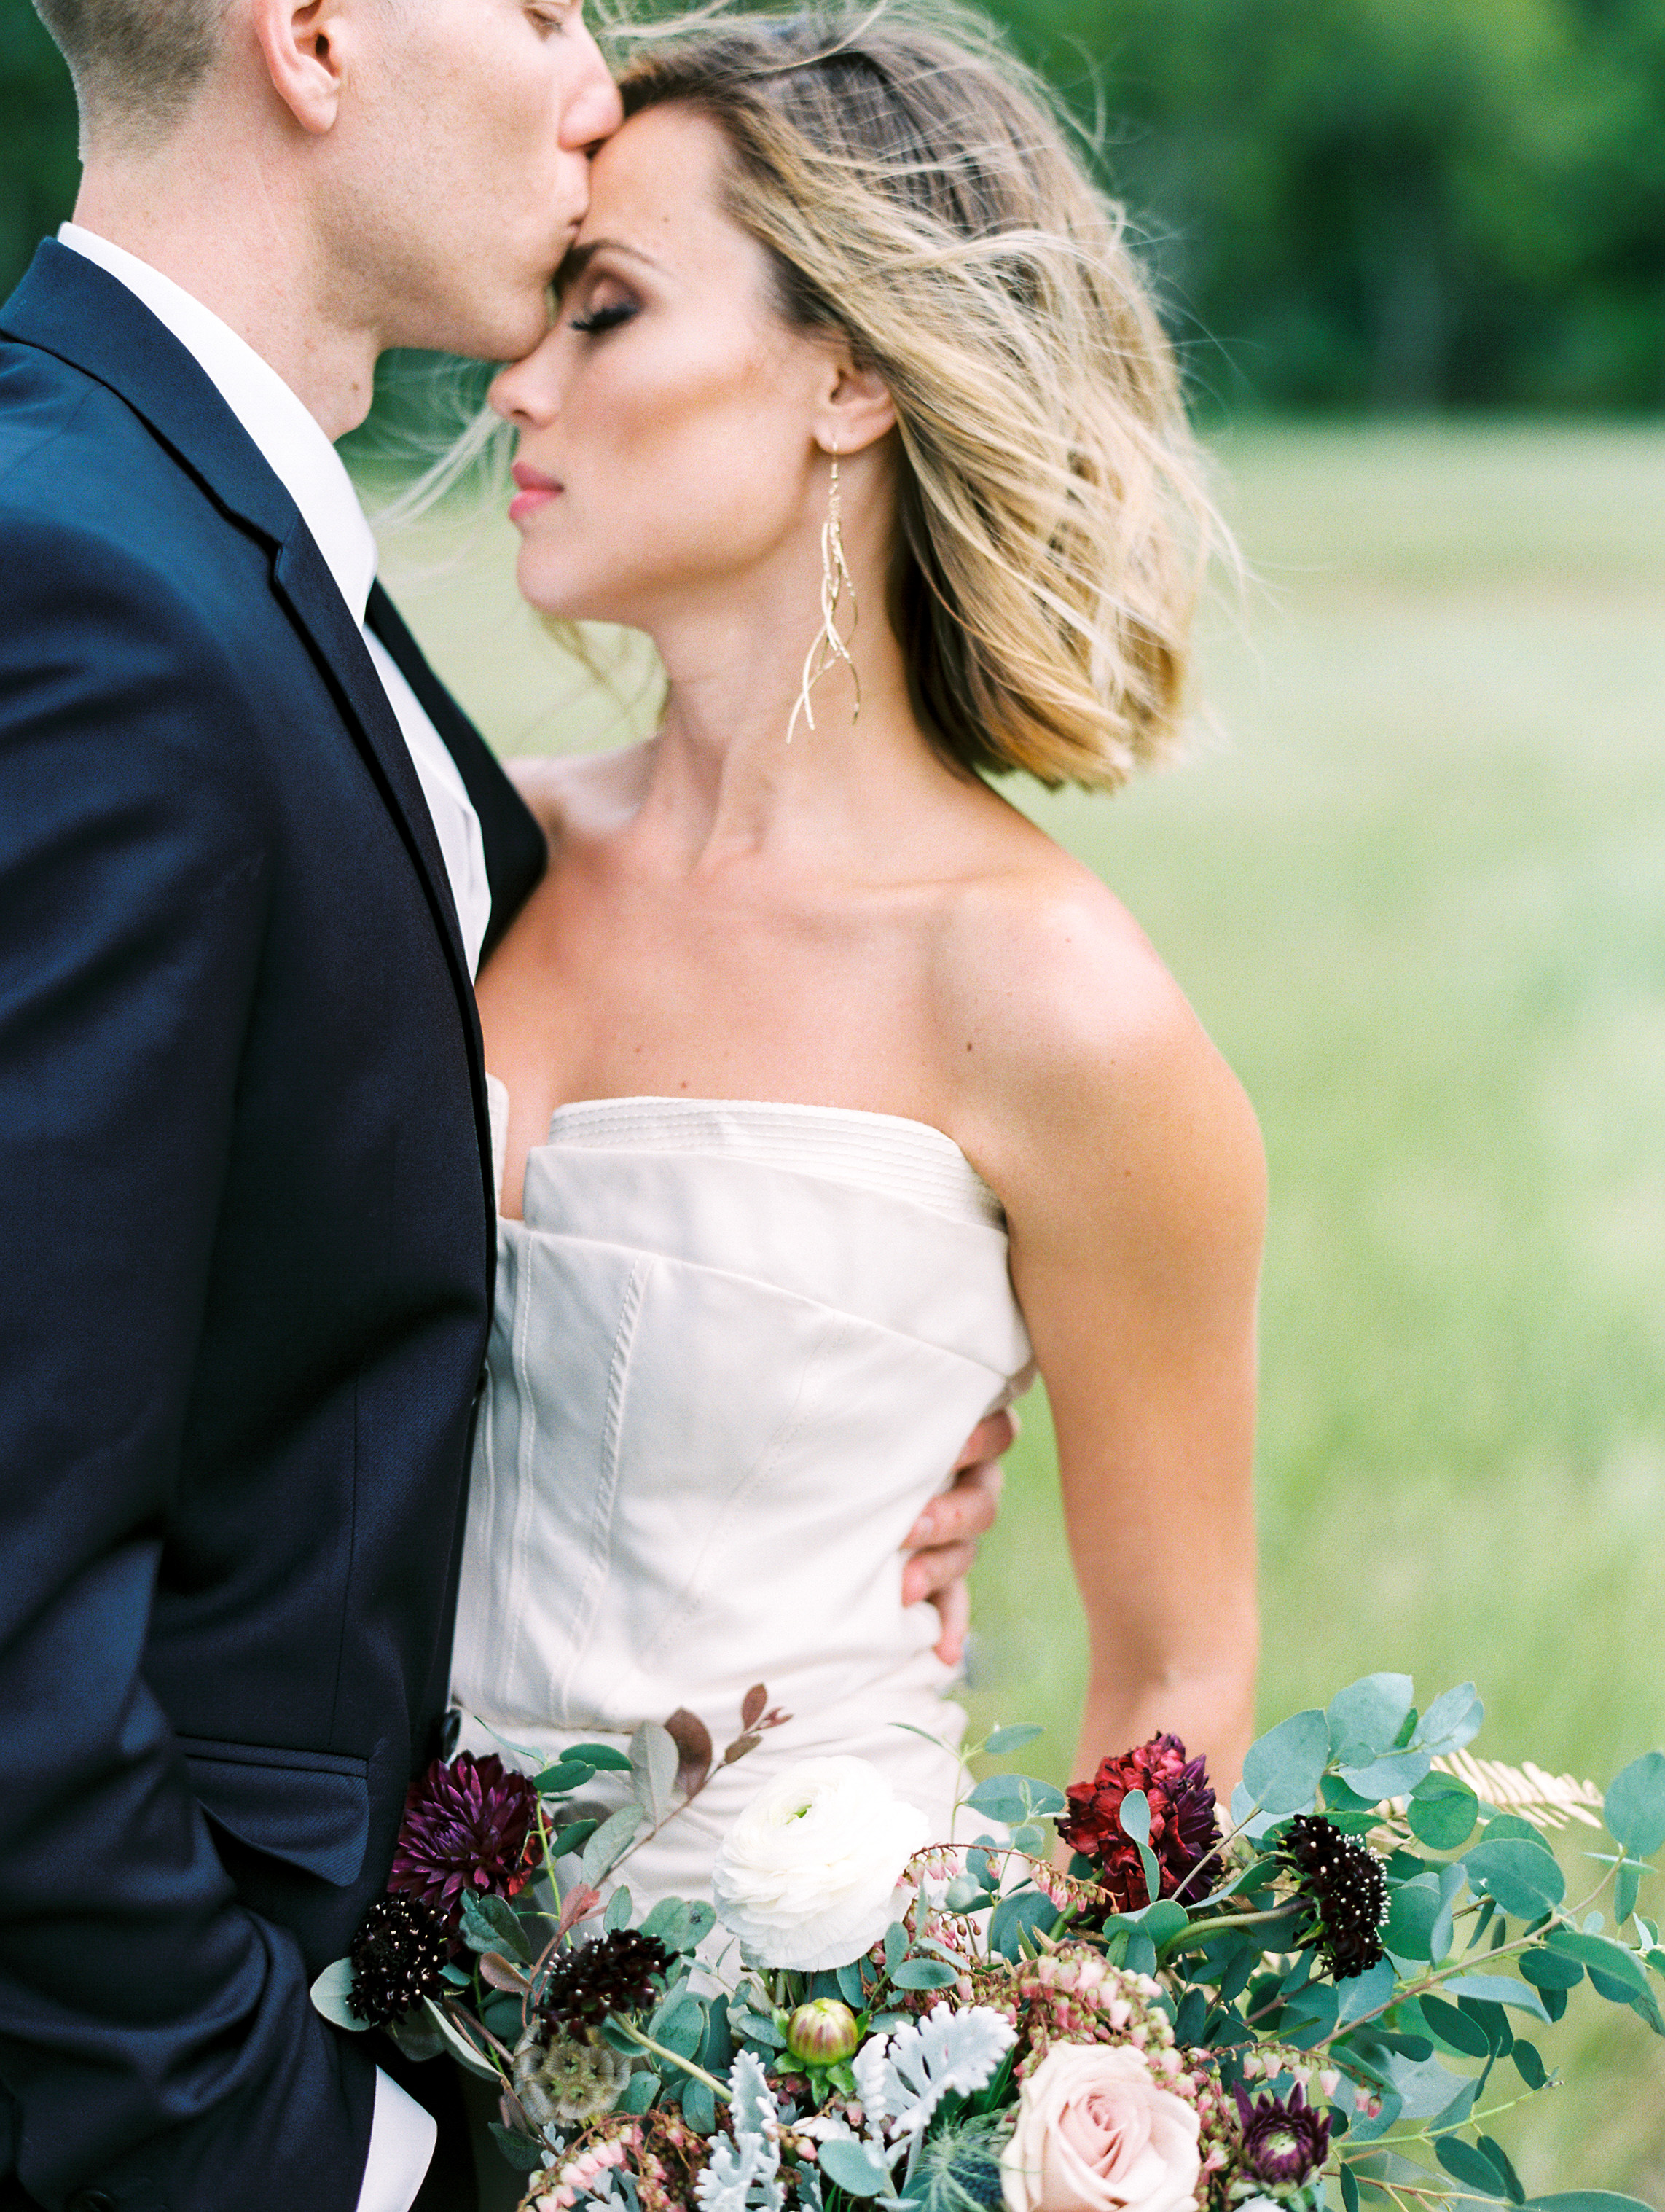 Dana-Fernandez-Photography-Houston-Wedding-Photographer-Film-100-Layer-Cake-Wedding-Inspiration-Destination-16.jpg